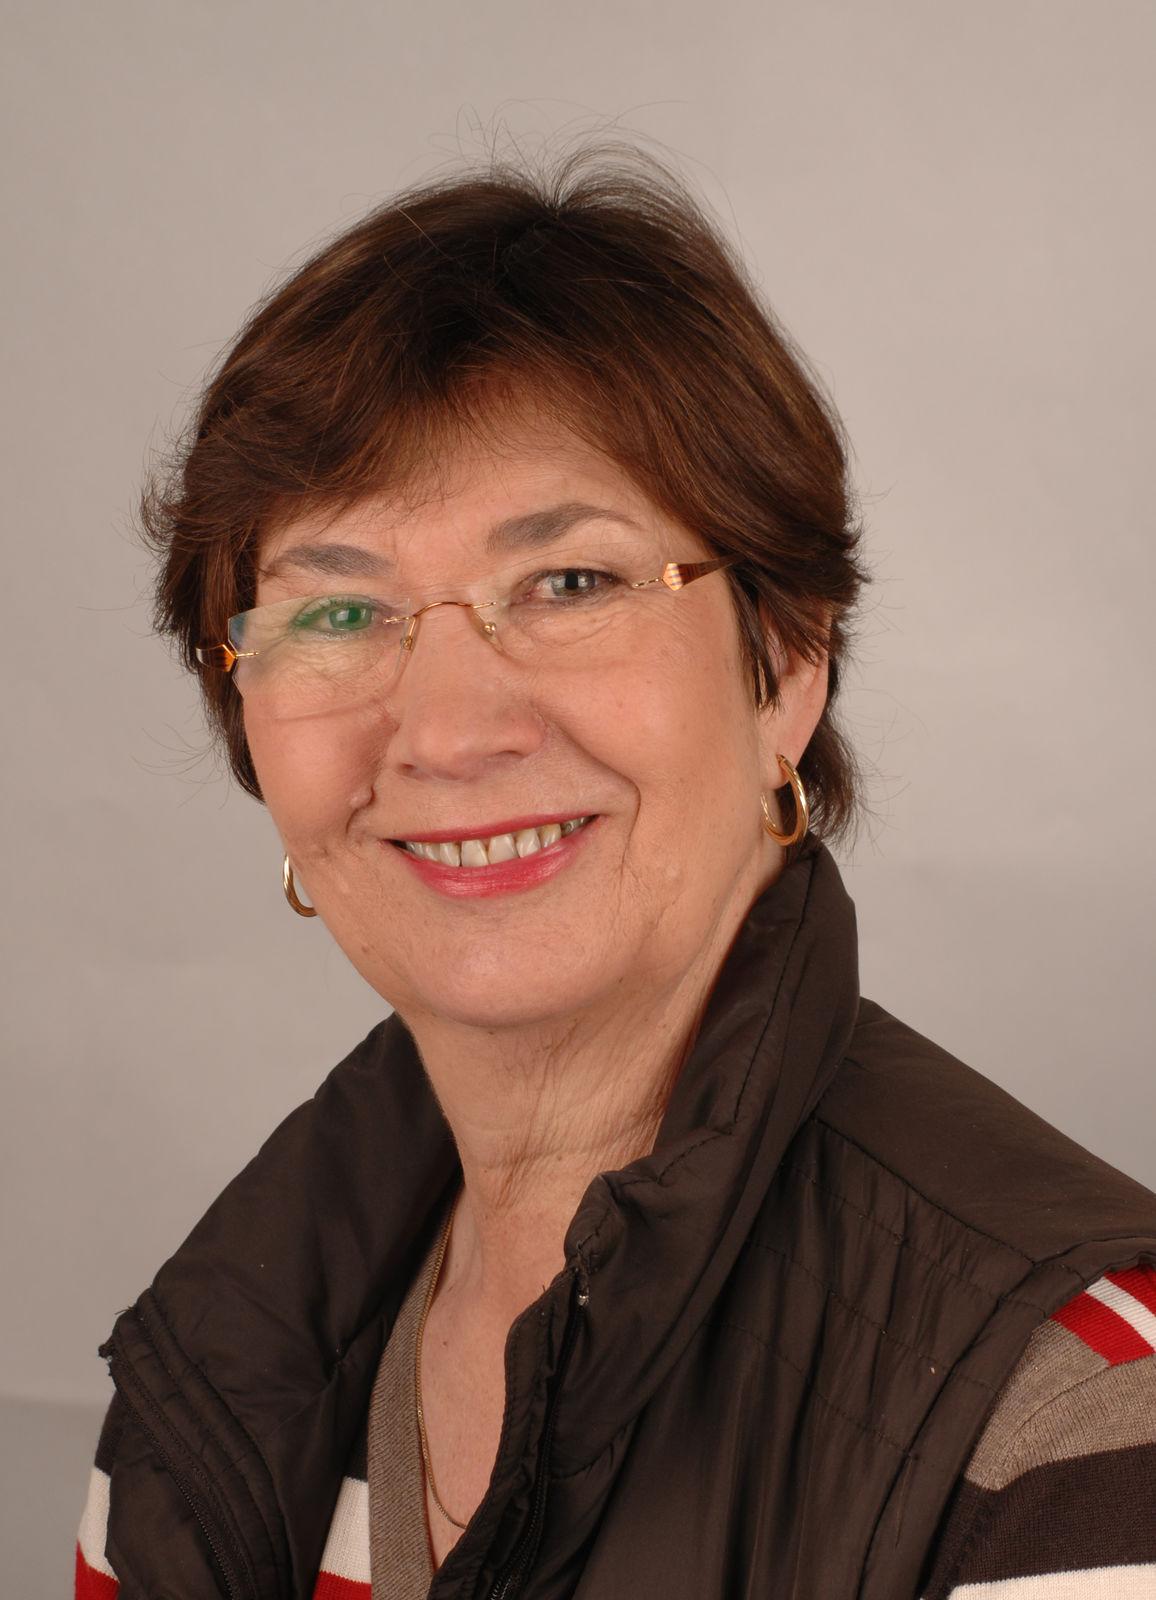 Carola Harnau